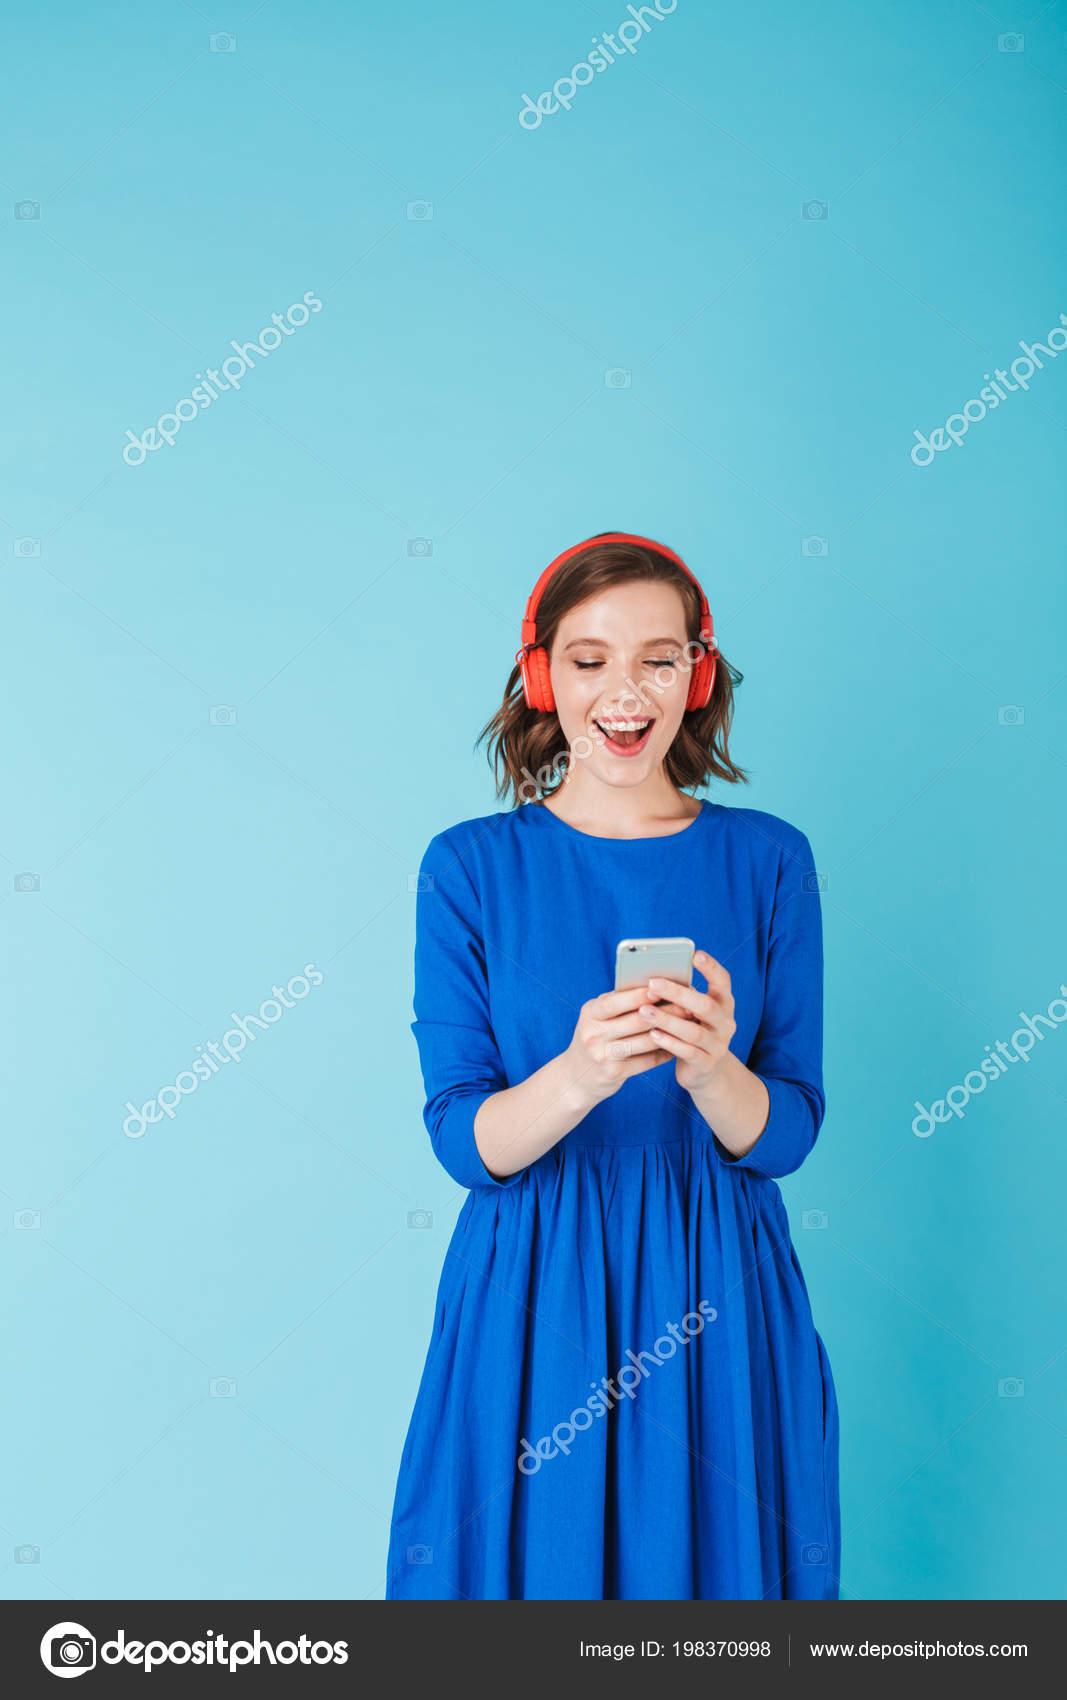 1b3030b95 Retrato Joven Hermosa Vestido Azul Escuchar Música Auriculares Mientras  Esté — Foto de Stock